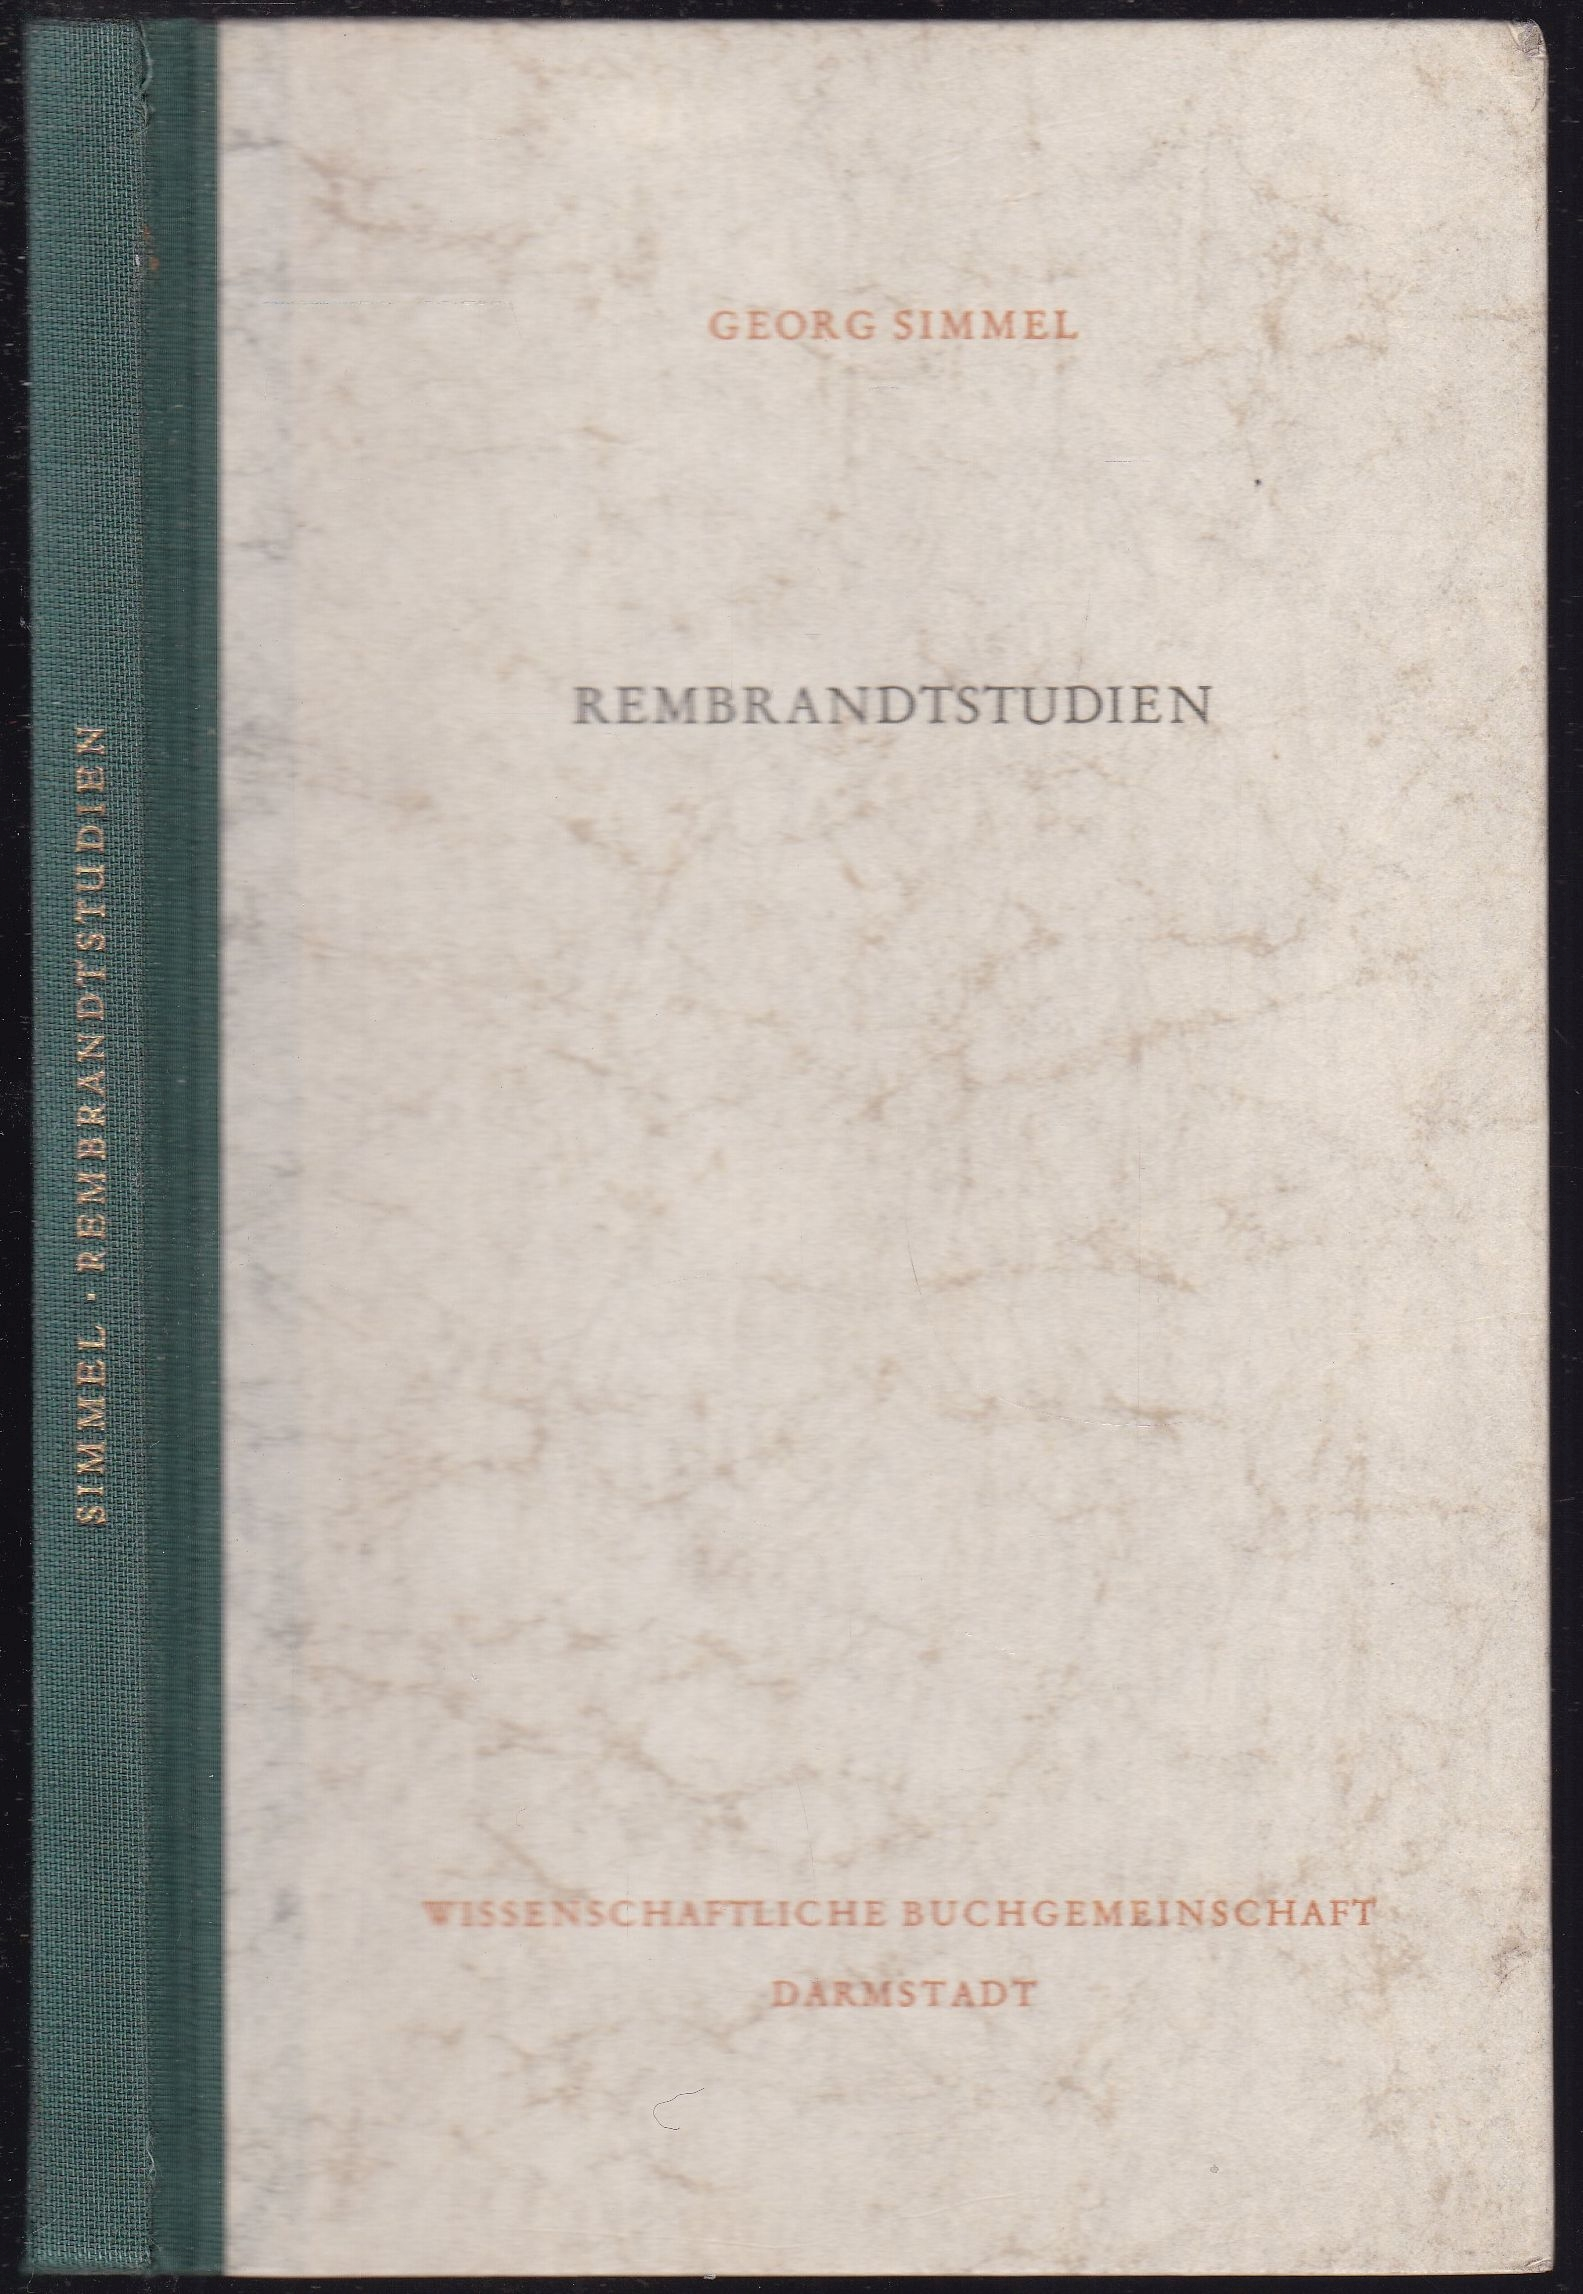 Rembrandtstudien: Simmel, Georg